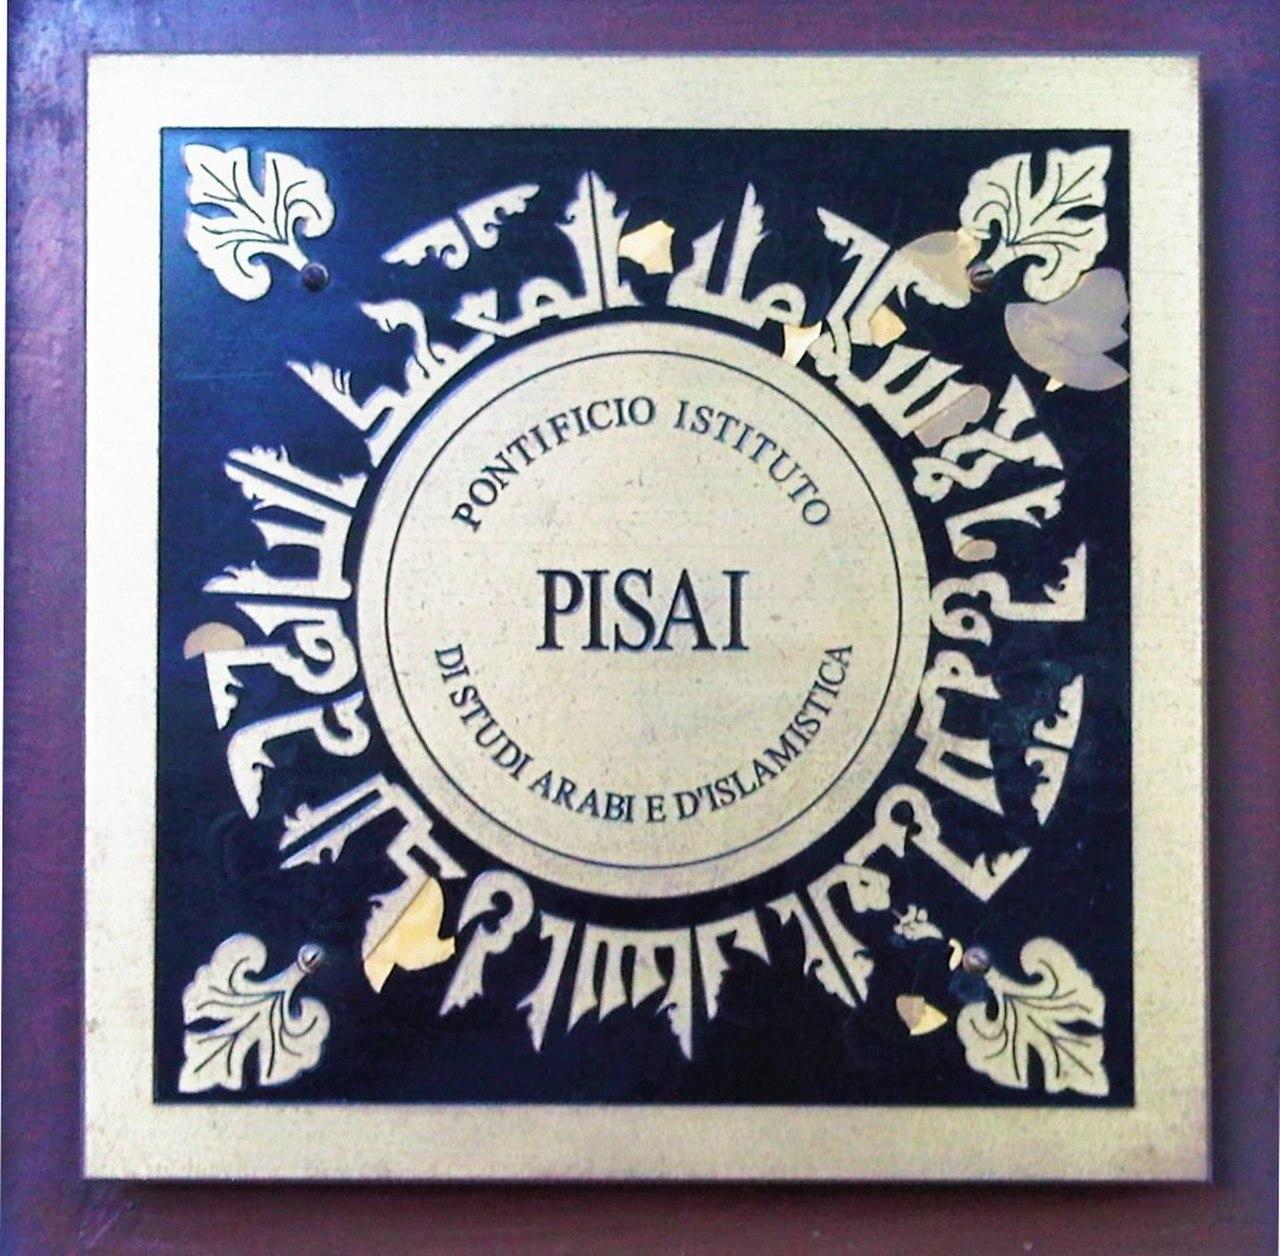 File:PISAI plate entrance jpg - Wikimedia Commons